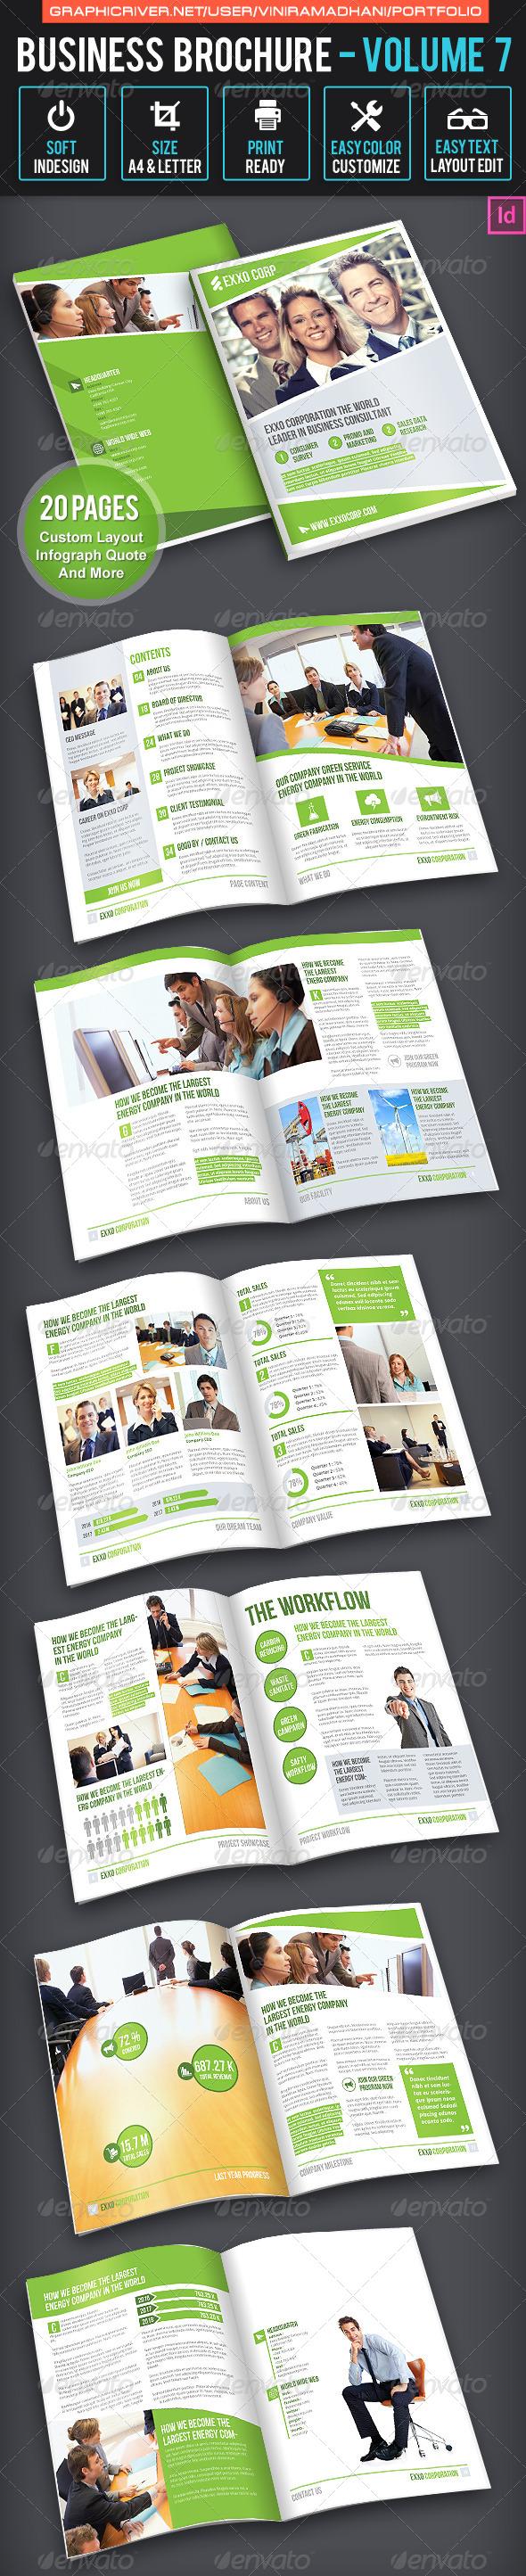 Business Brochure Volume 7